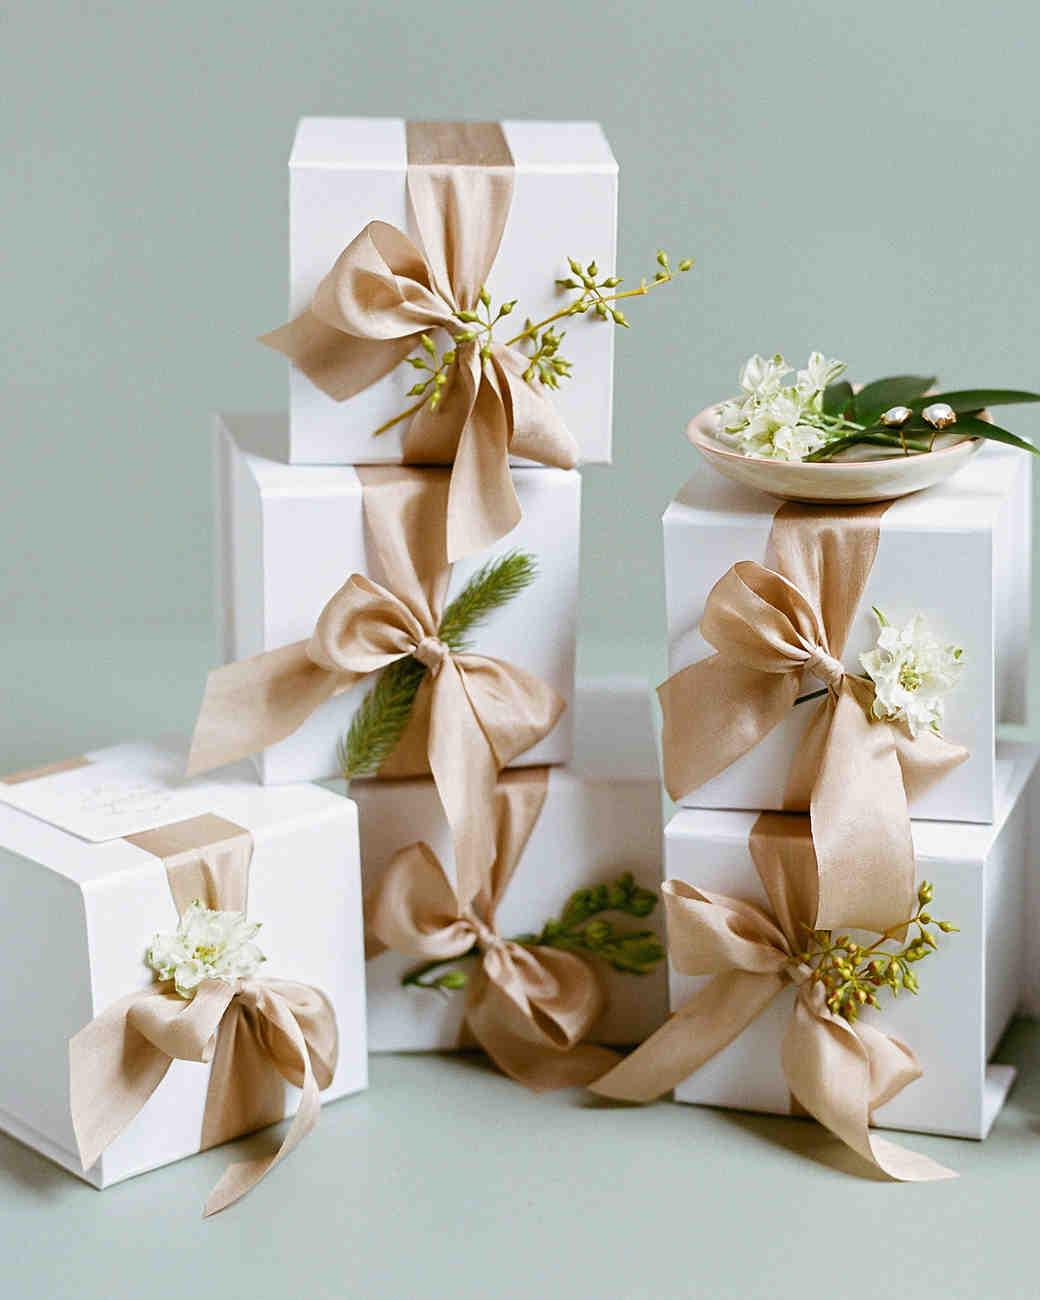 Souvenirs Wedding Gifts: 34 Festive Fall Wedding Favor Ideas